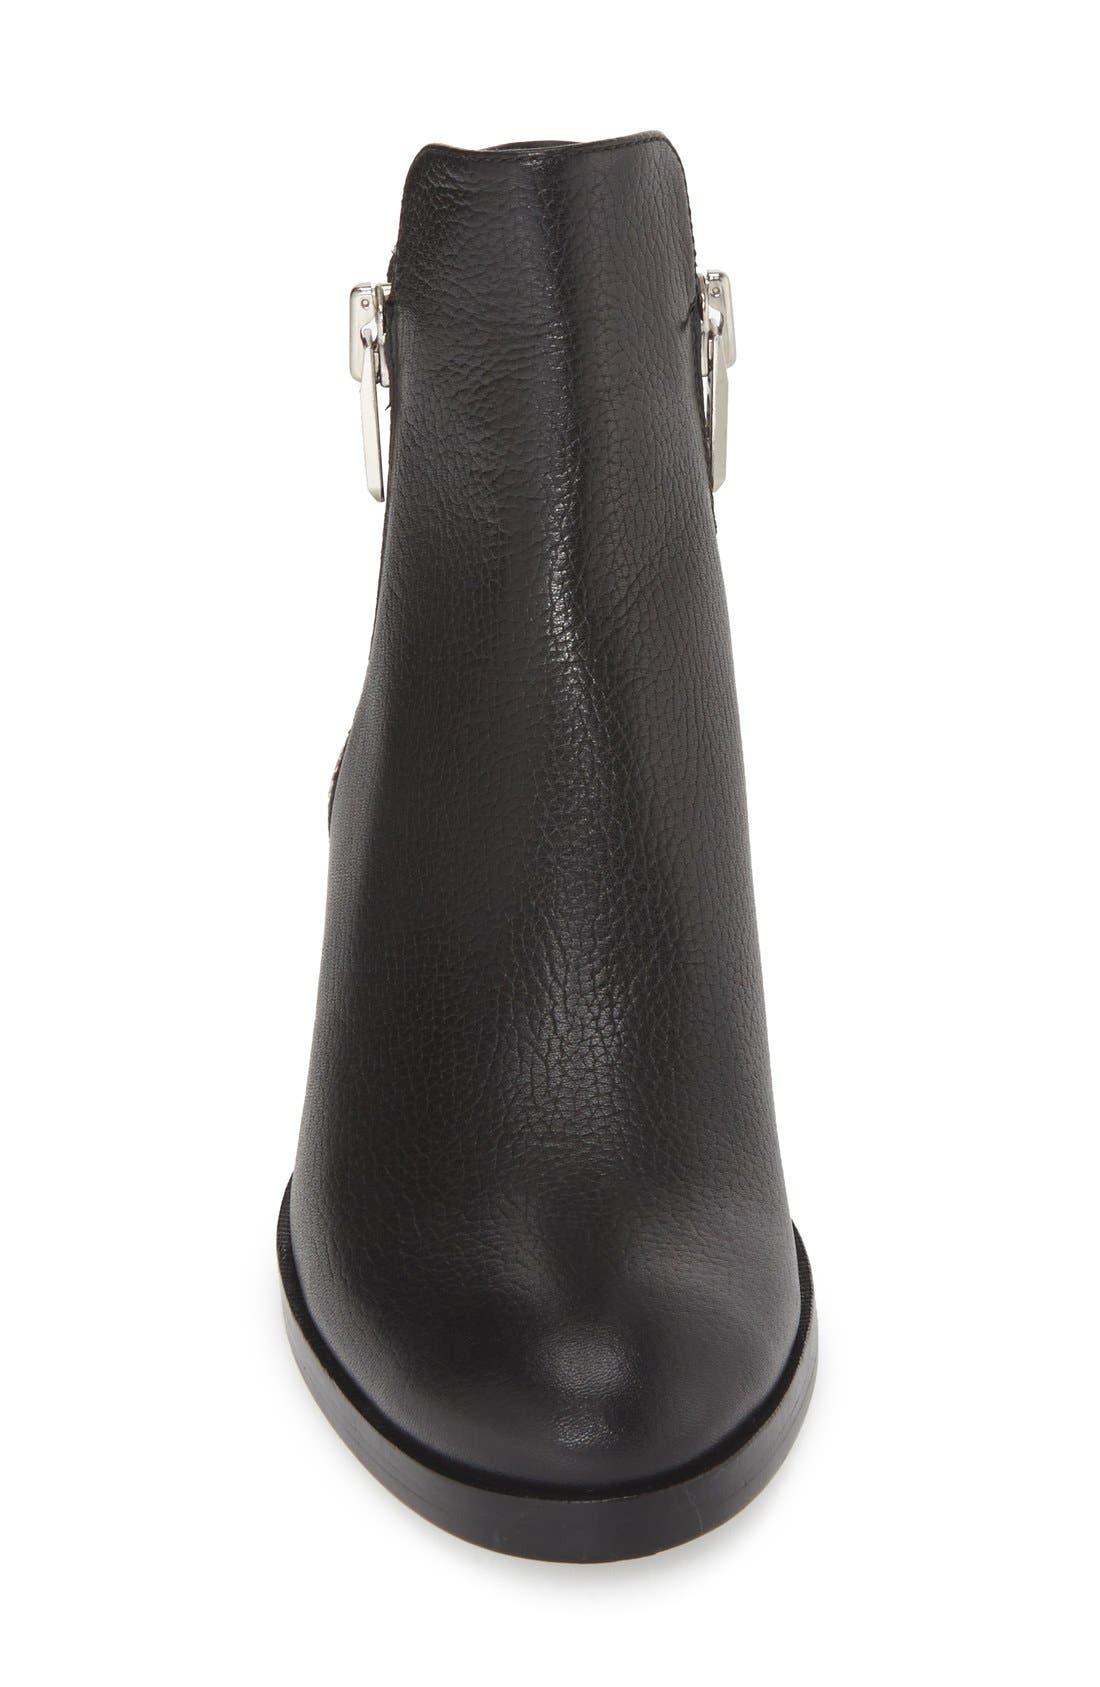 Alternate Image 3  - 3.1 Phillip Lim 'Alexa' Boot (Women)